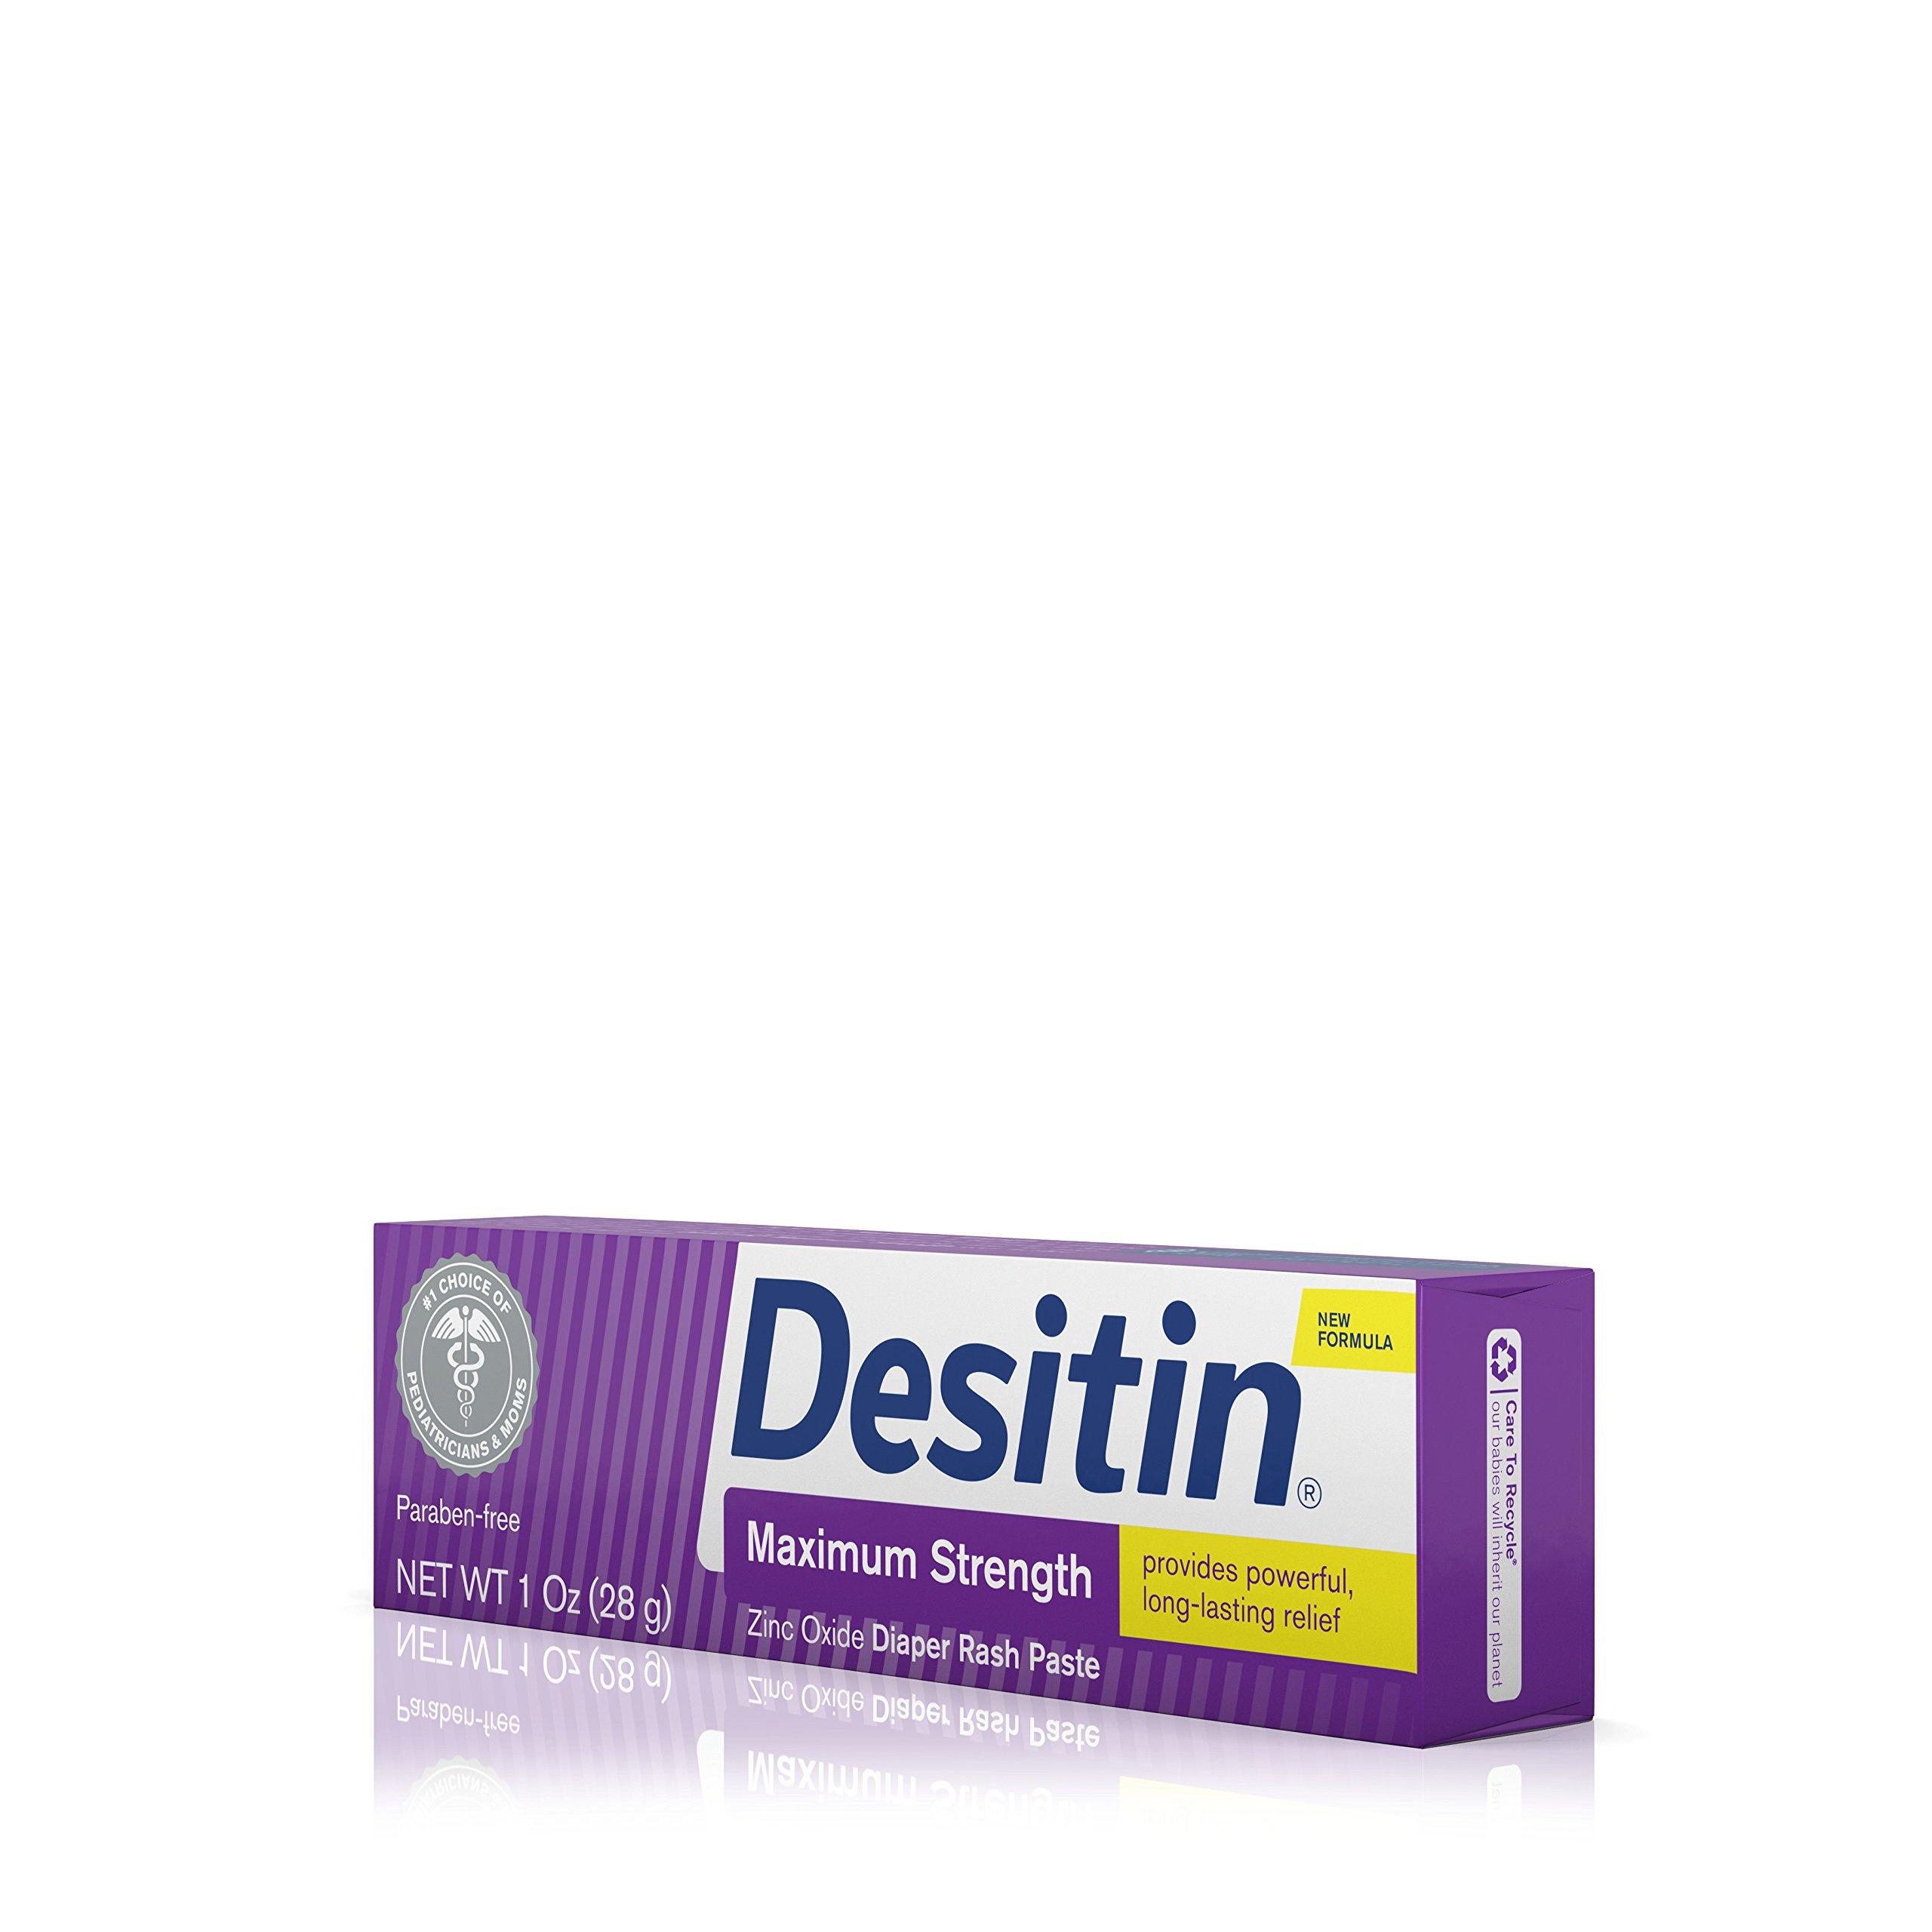 Desitin Diaper Rash Maximum Strength Original Paste, Travel Size, 1 Oz. Tube (Pack of 6) by Desitin (Image #10)